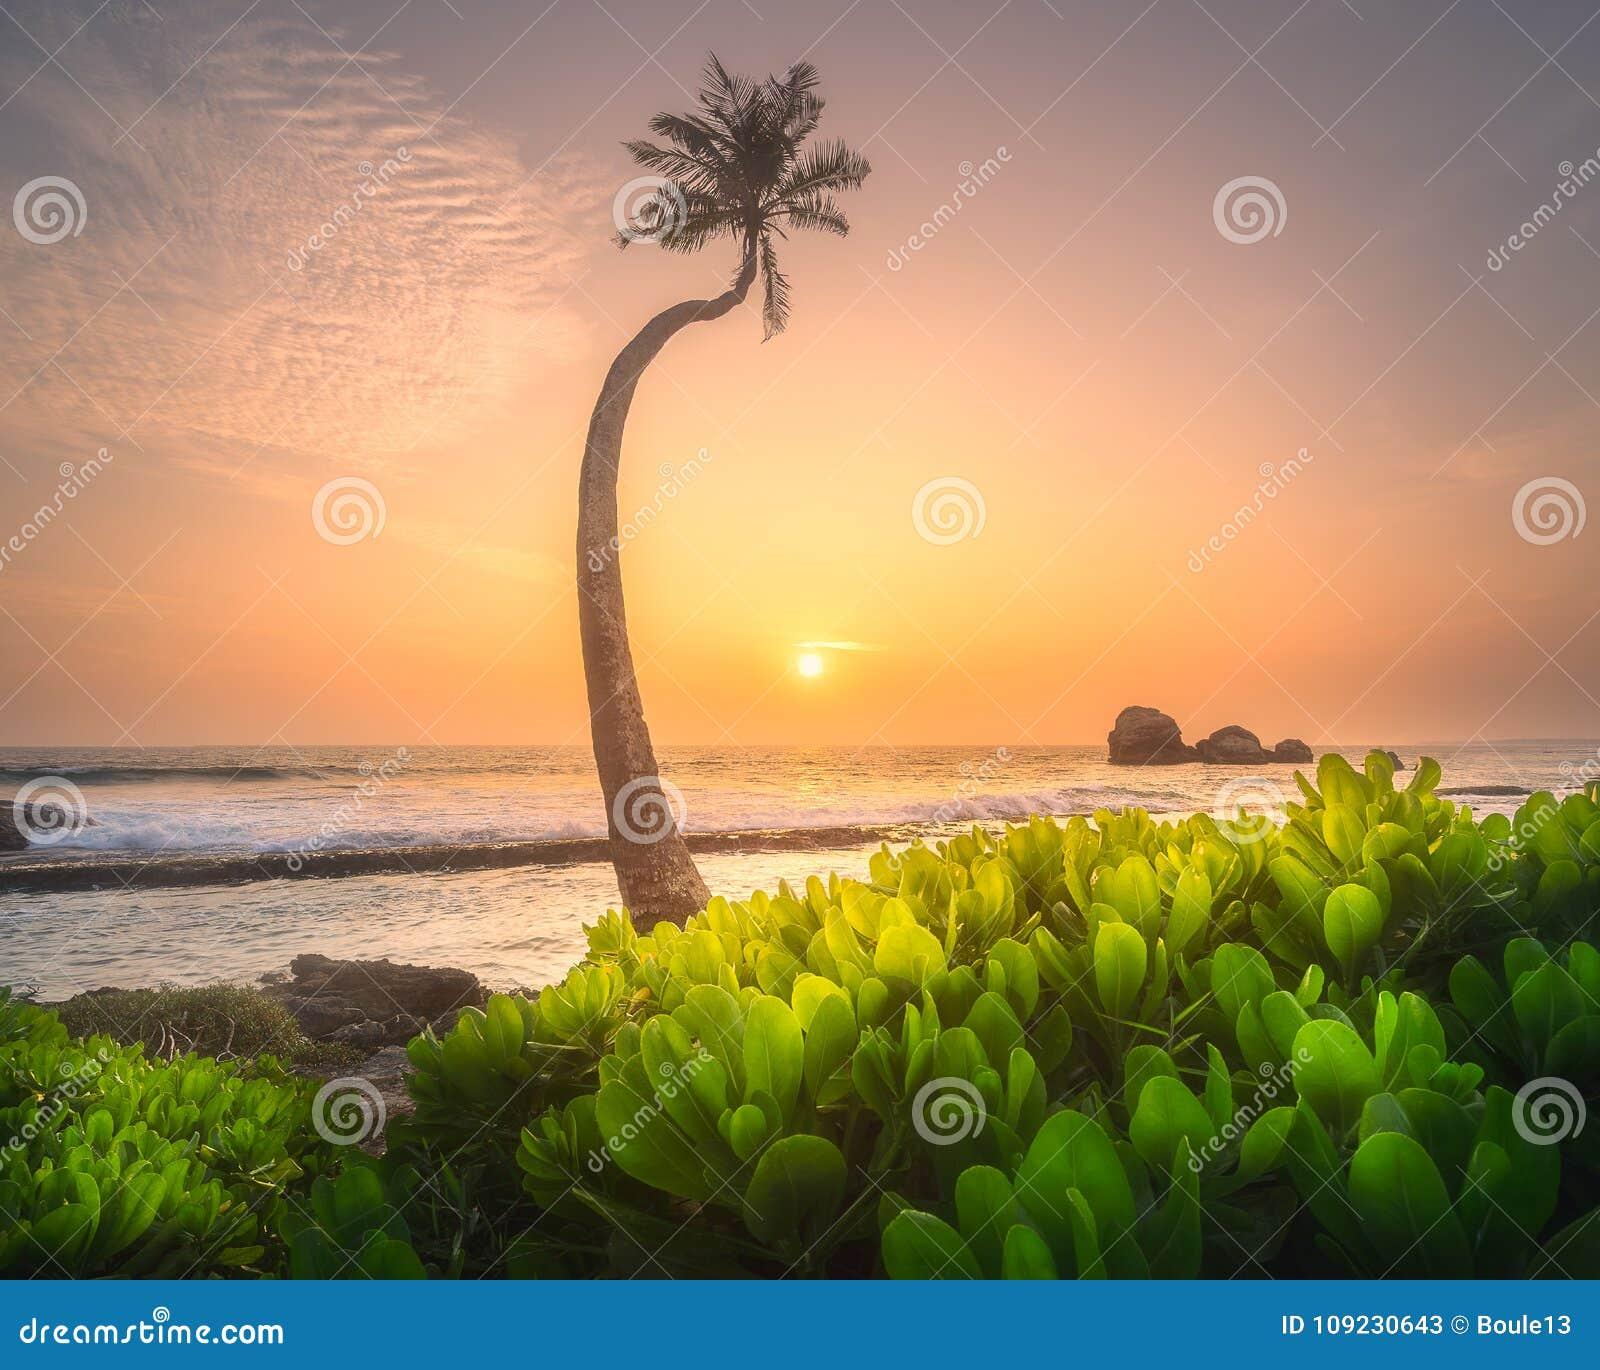 Tree under the water and coast of Sri Lanka beach